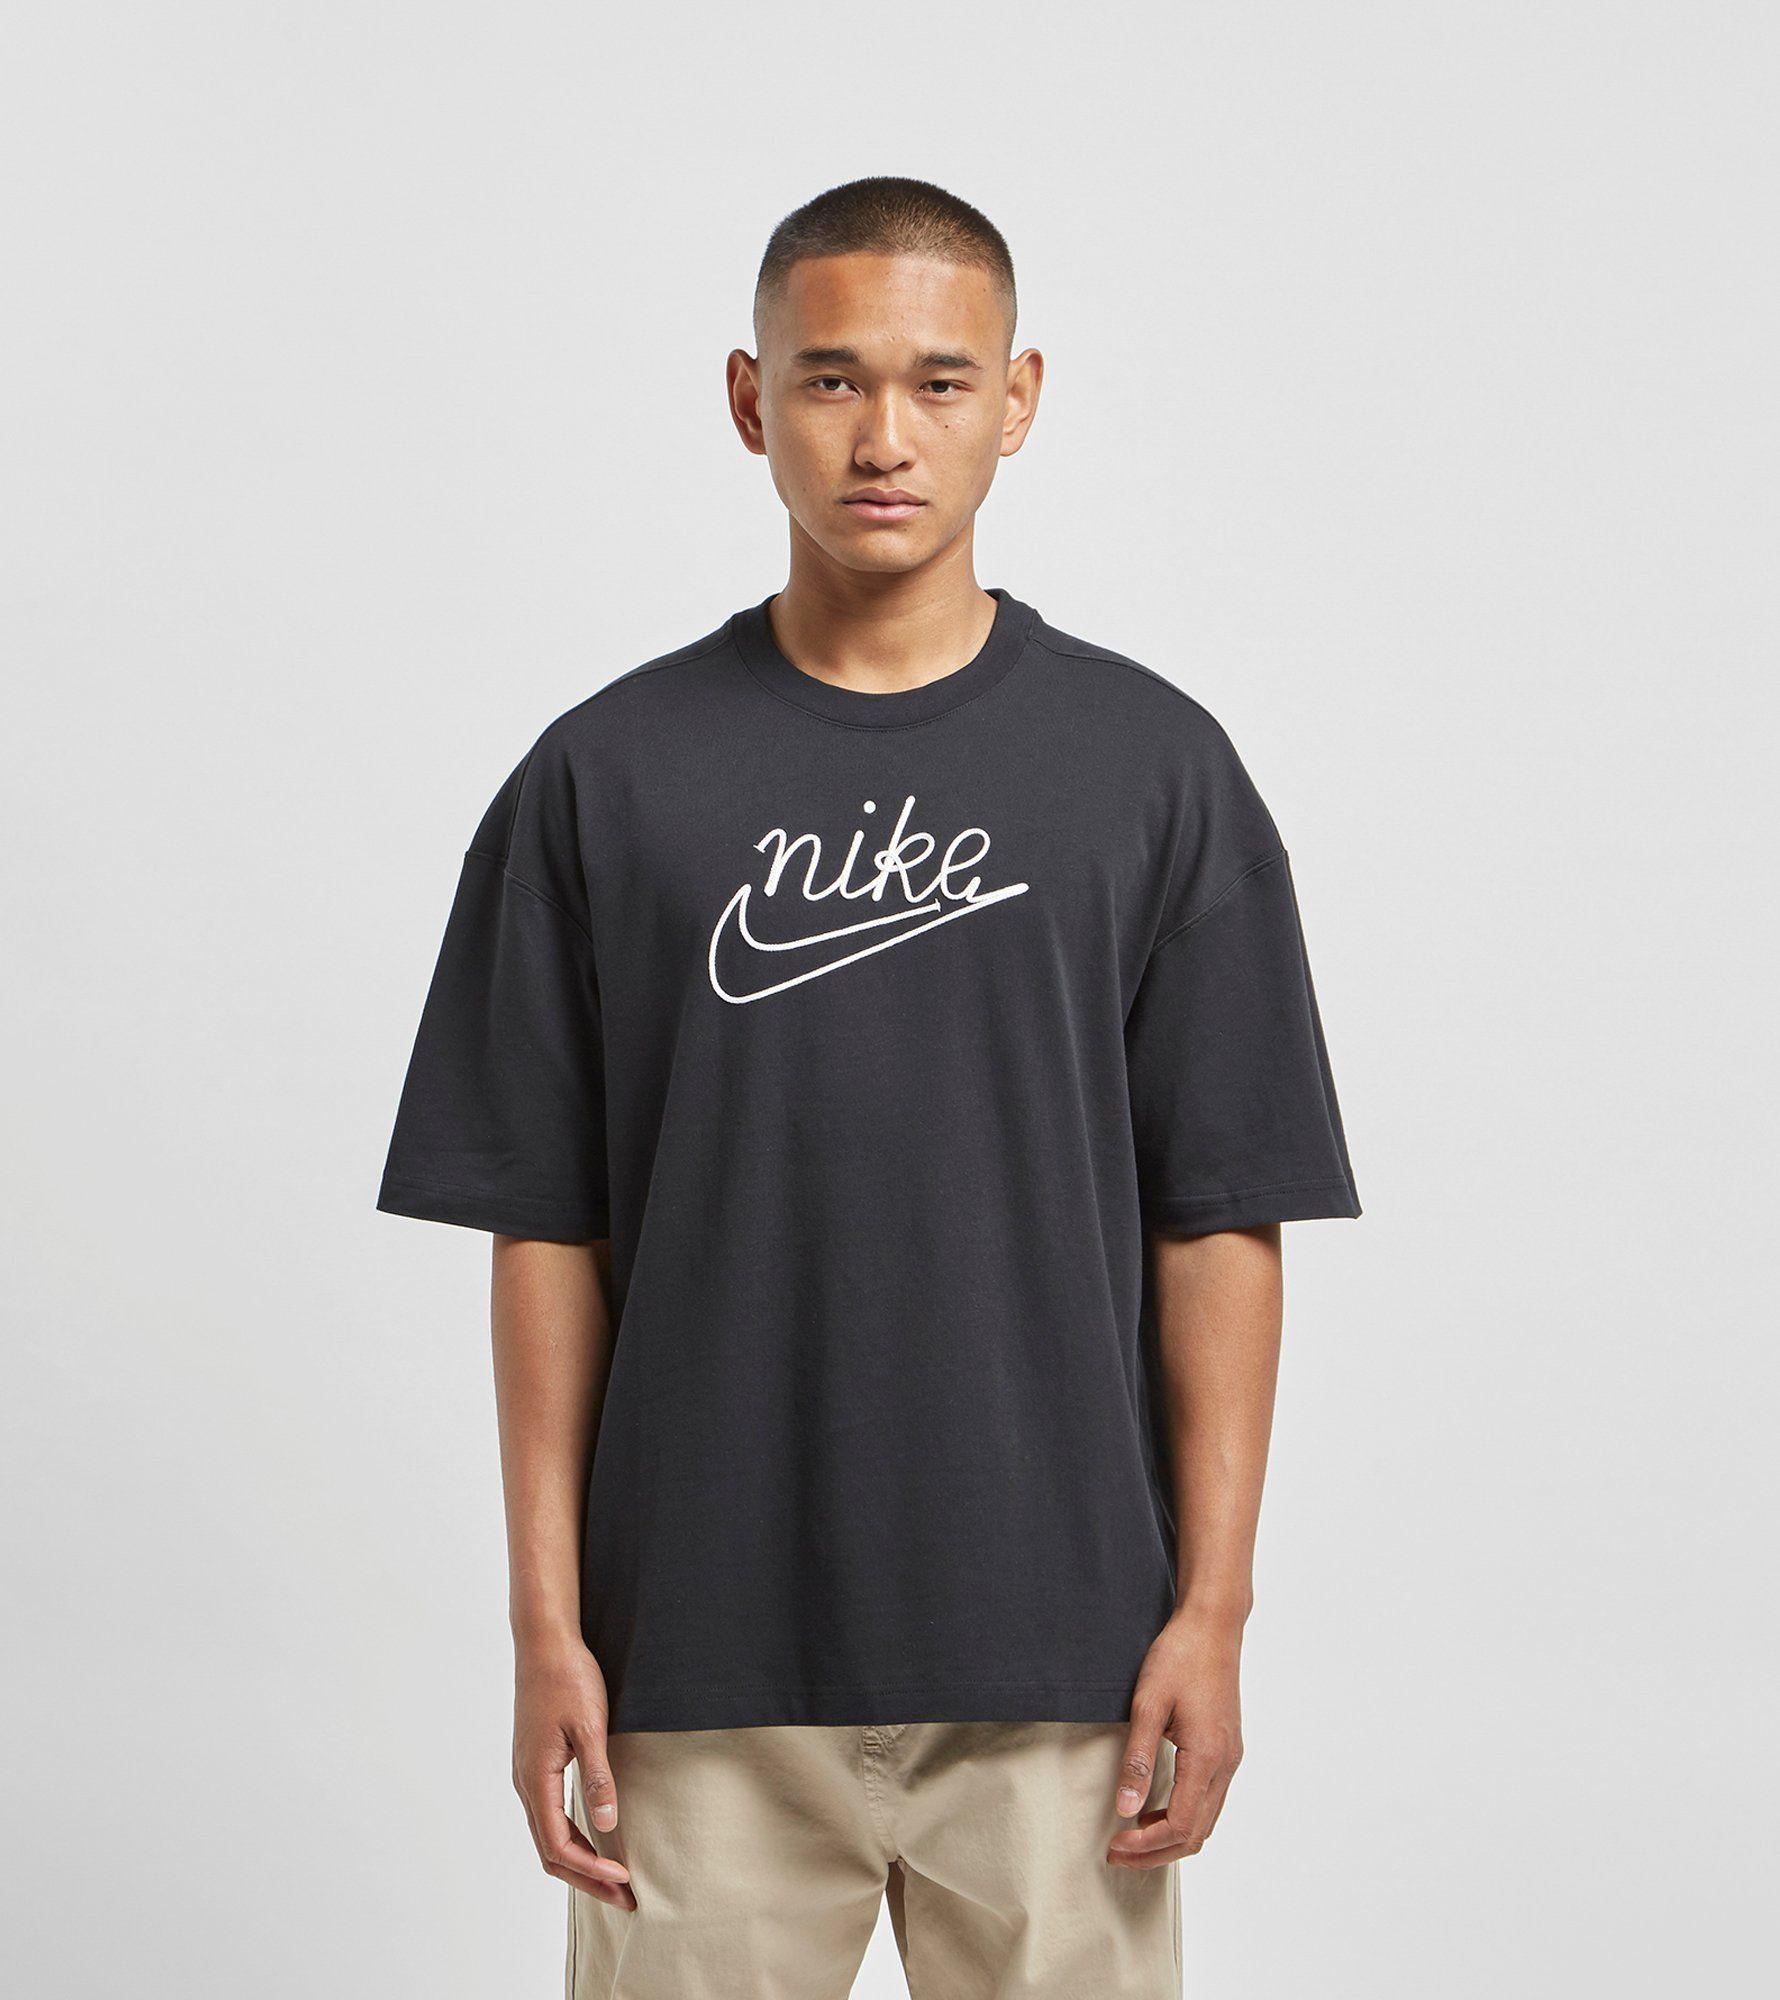 Nike T-Shirt Outline